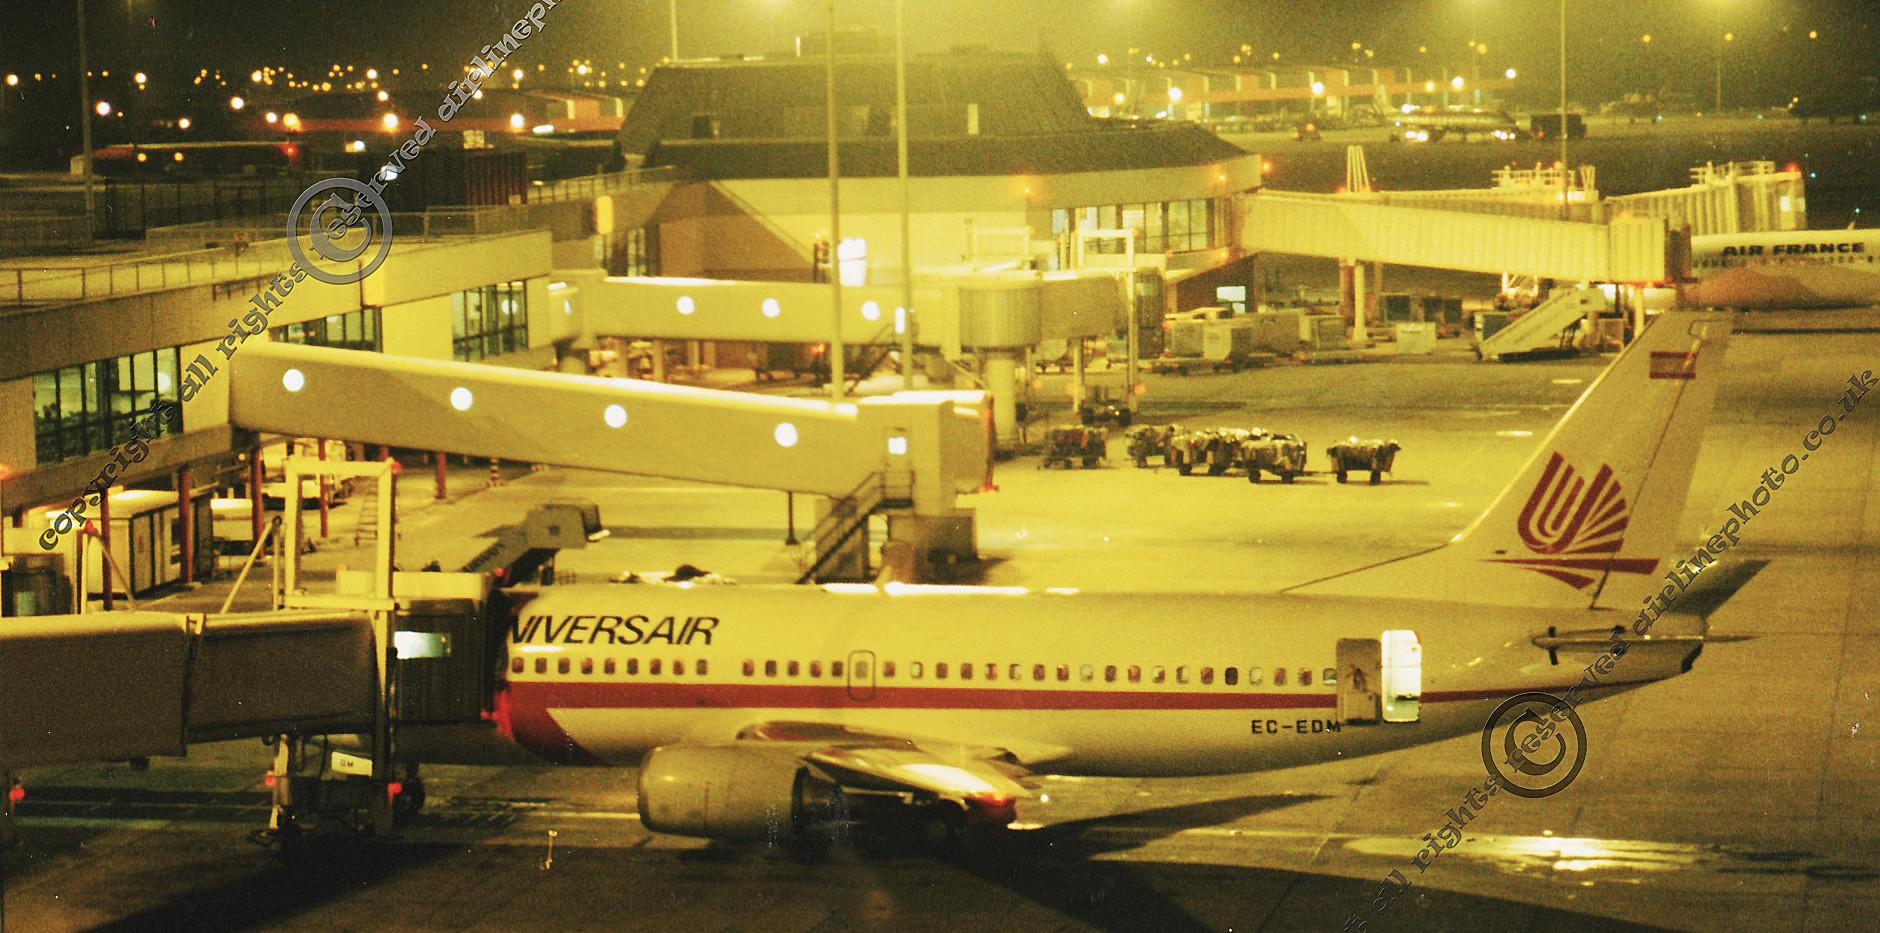 EC-EDM-Universair-737-MAN-1988.jpg